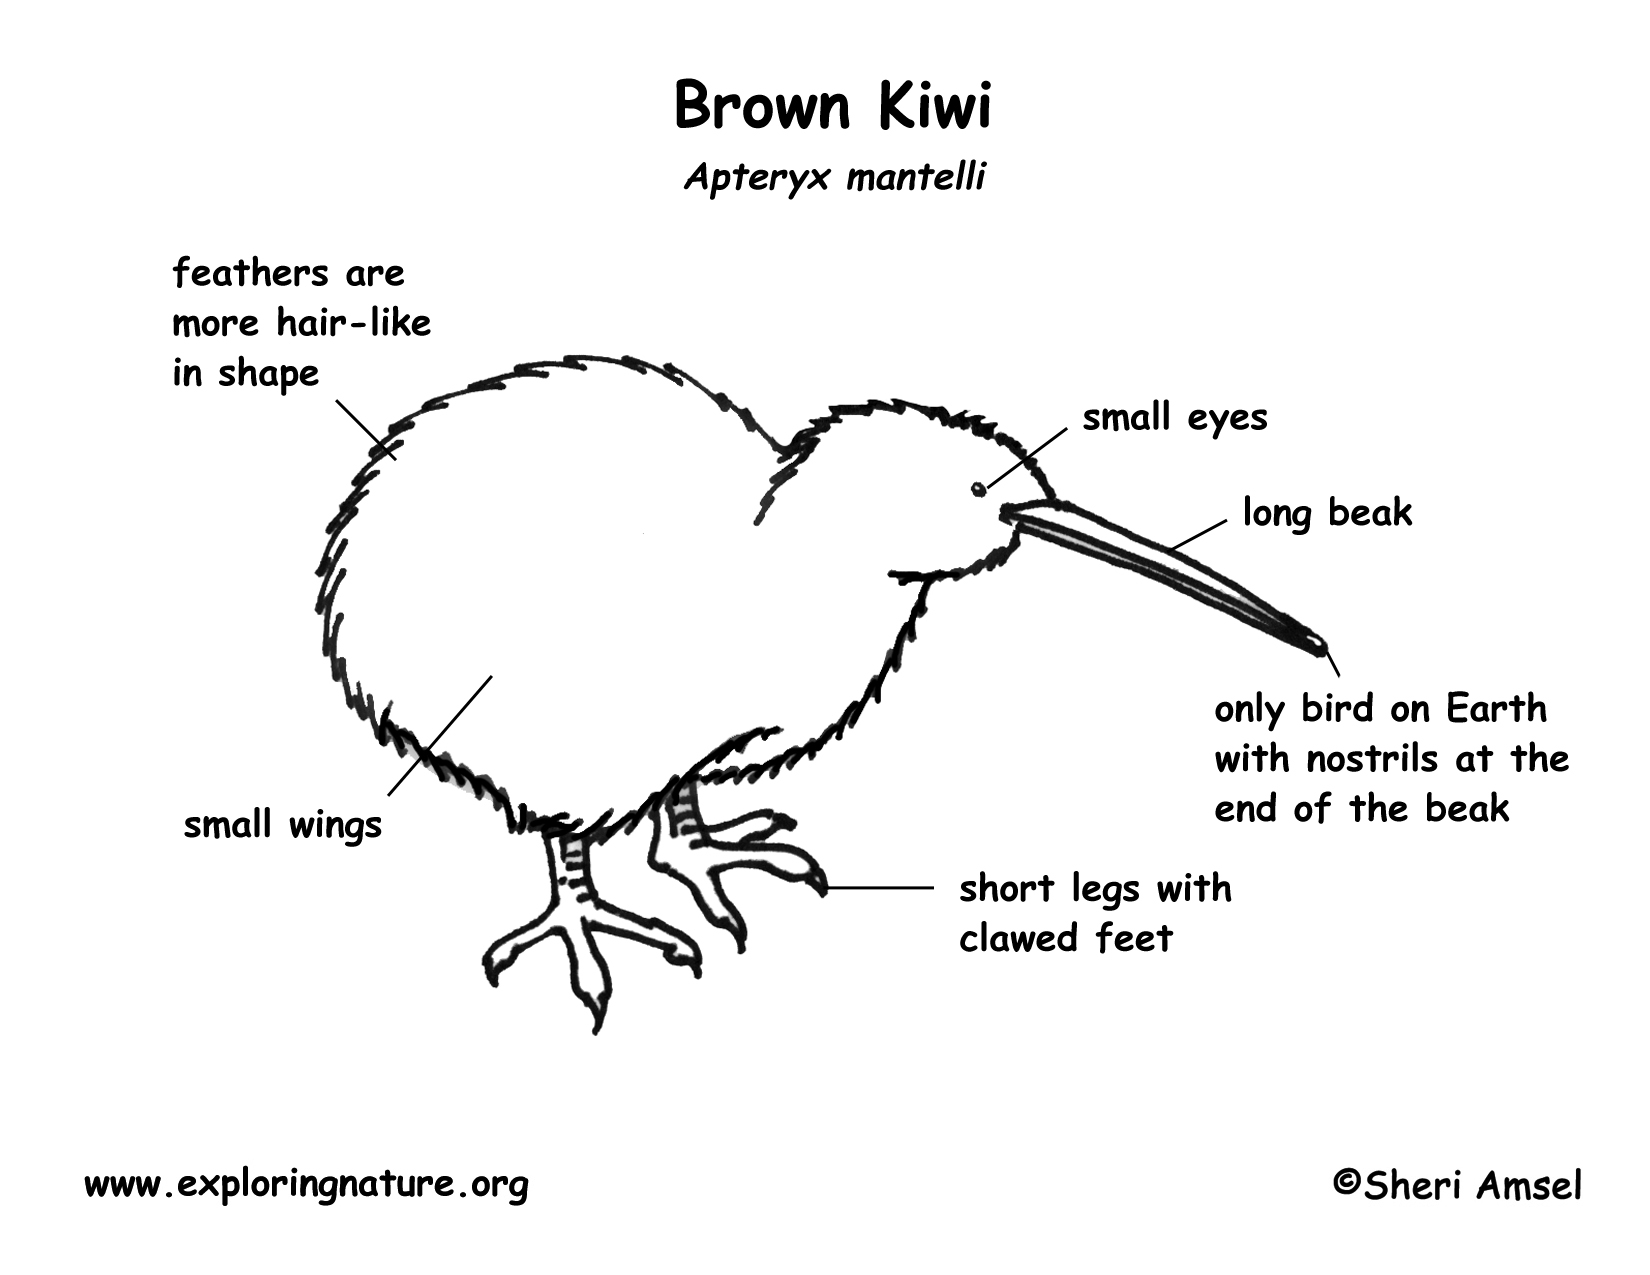 Kiwi Brown